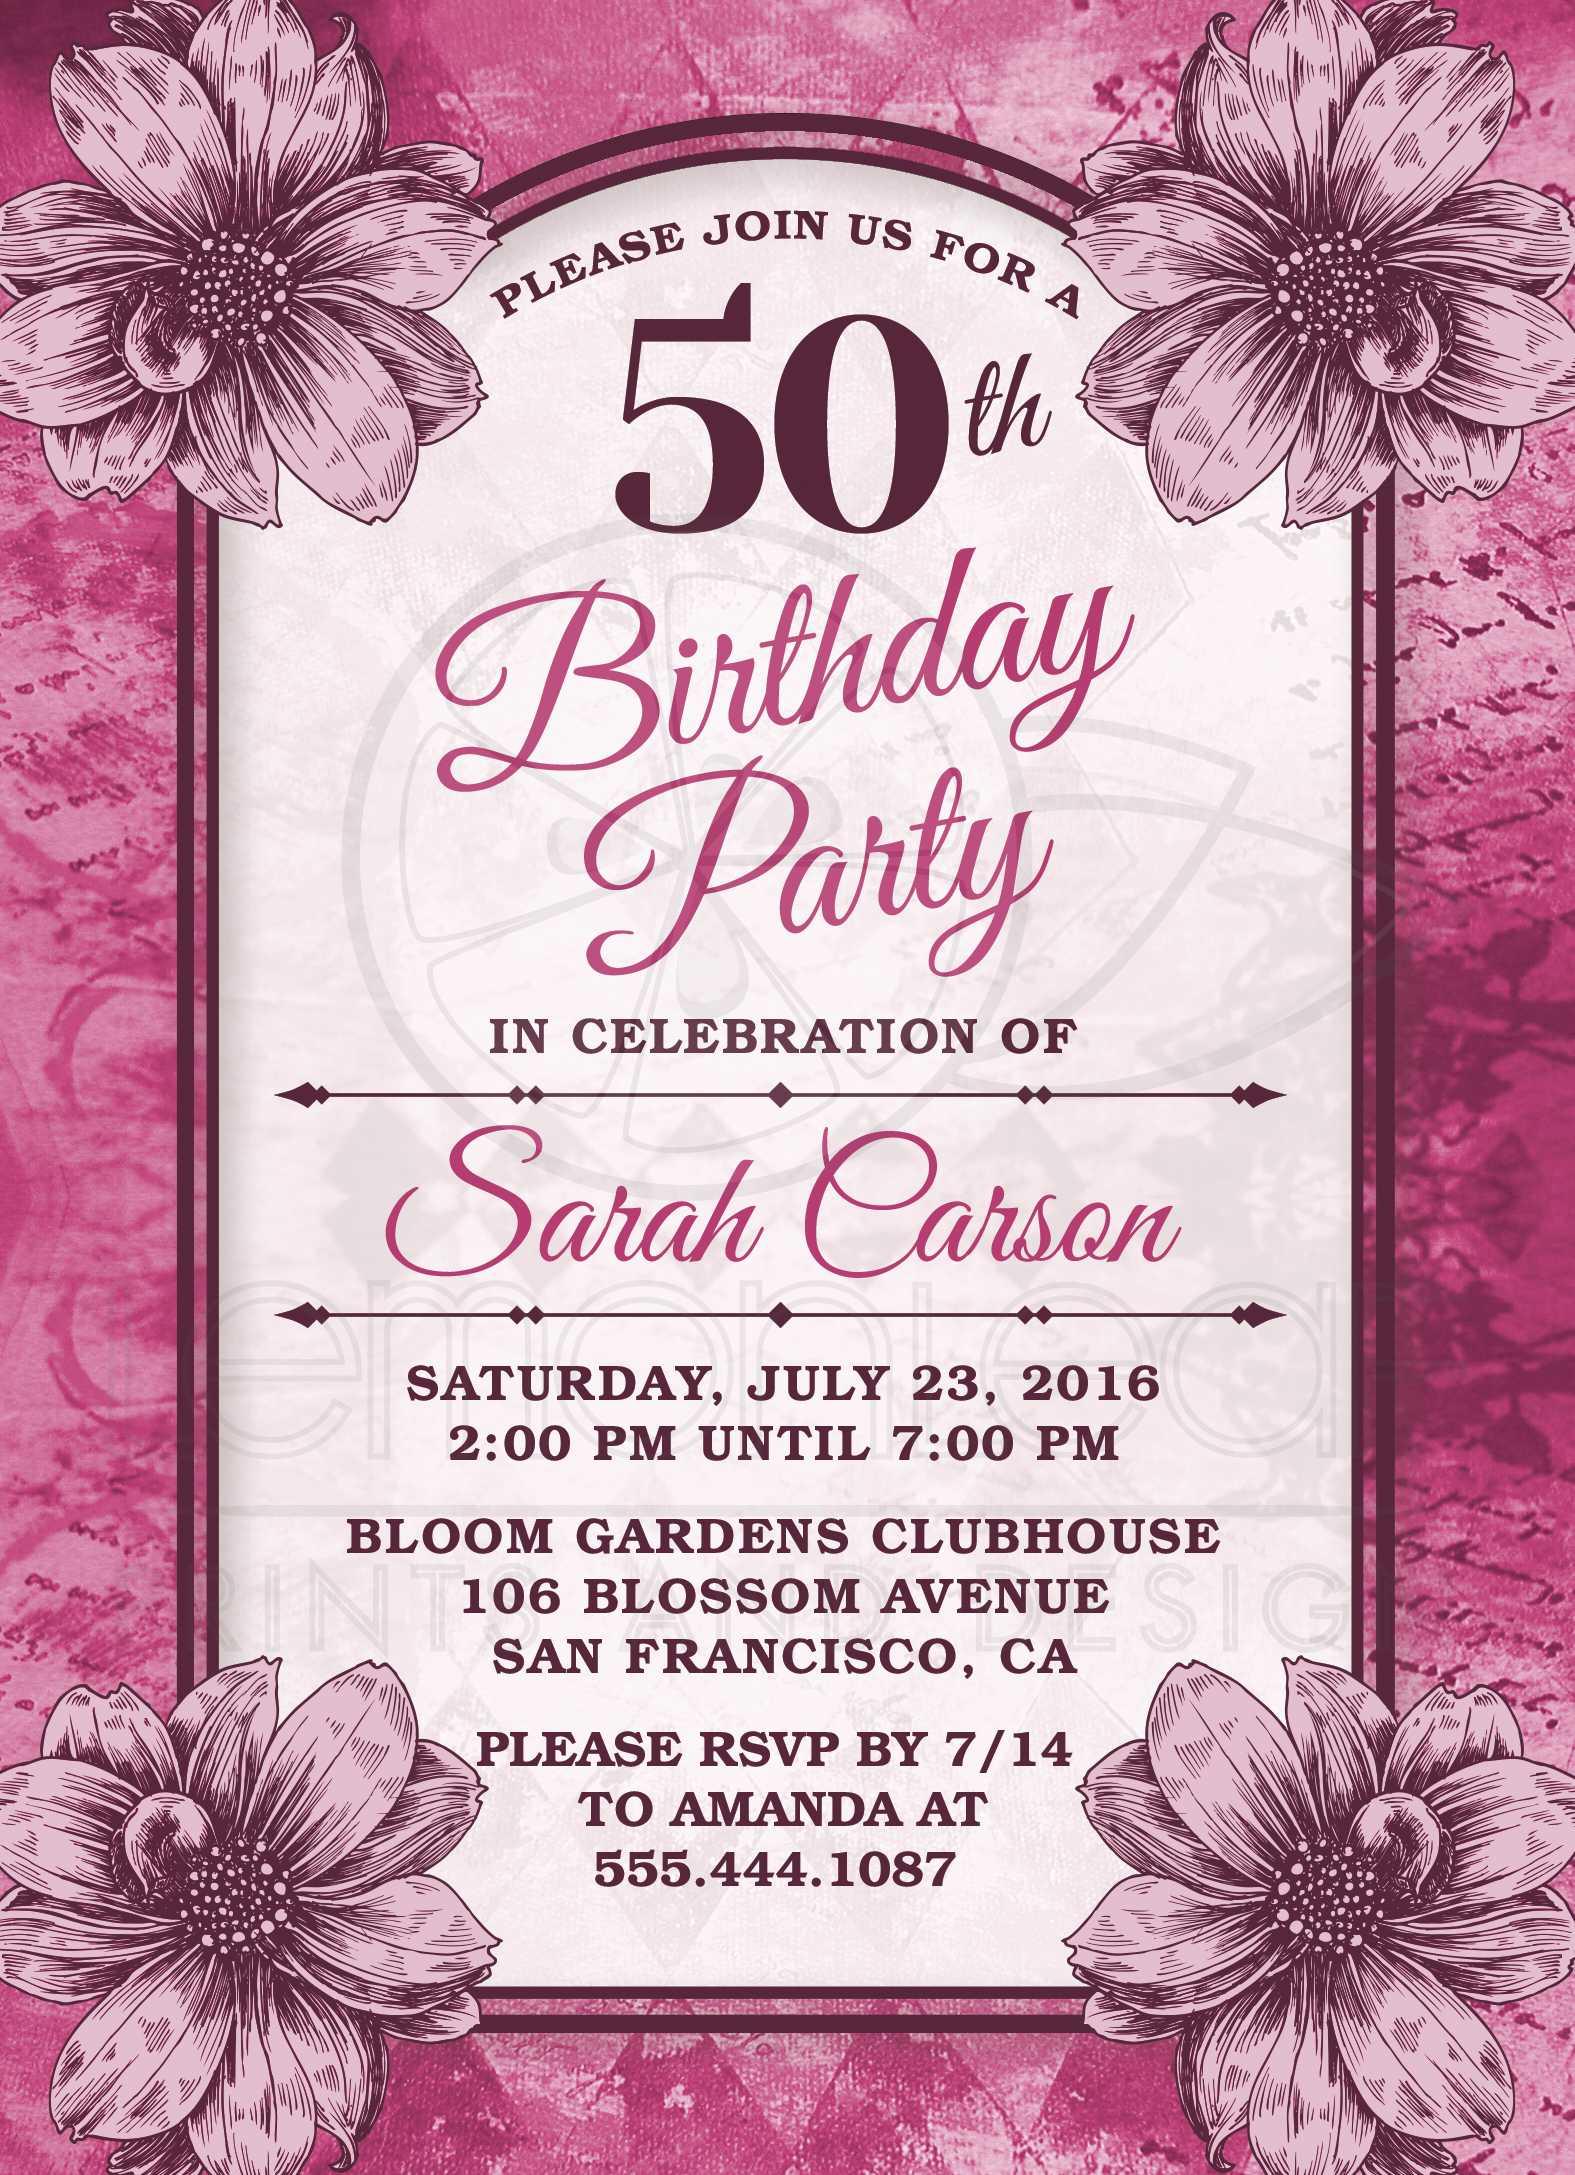 50th Birthday Party Invitations - Fuchsia Flowers